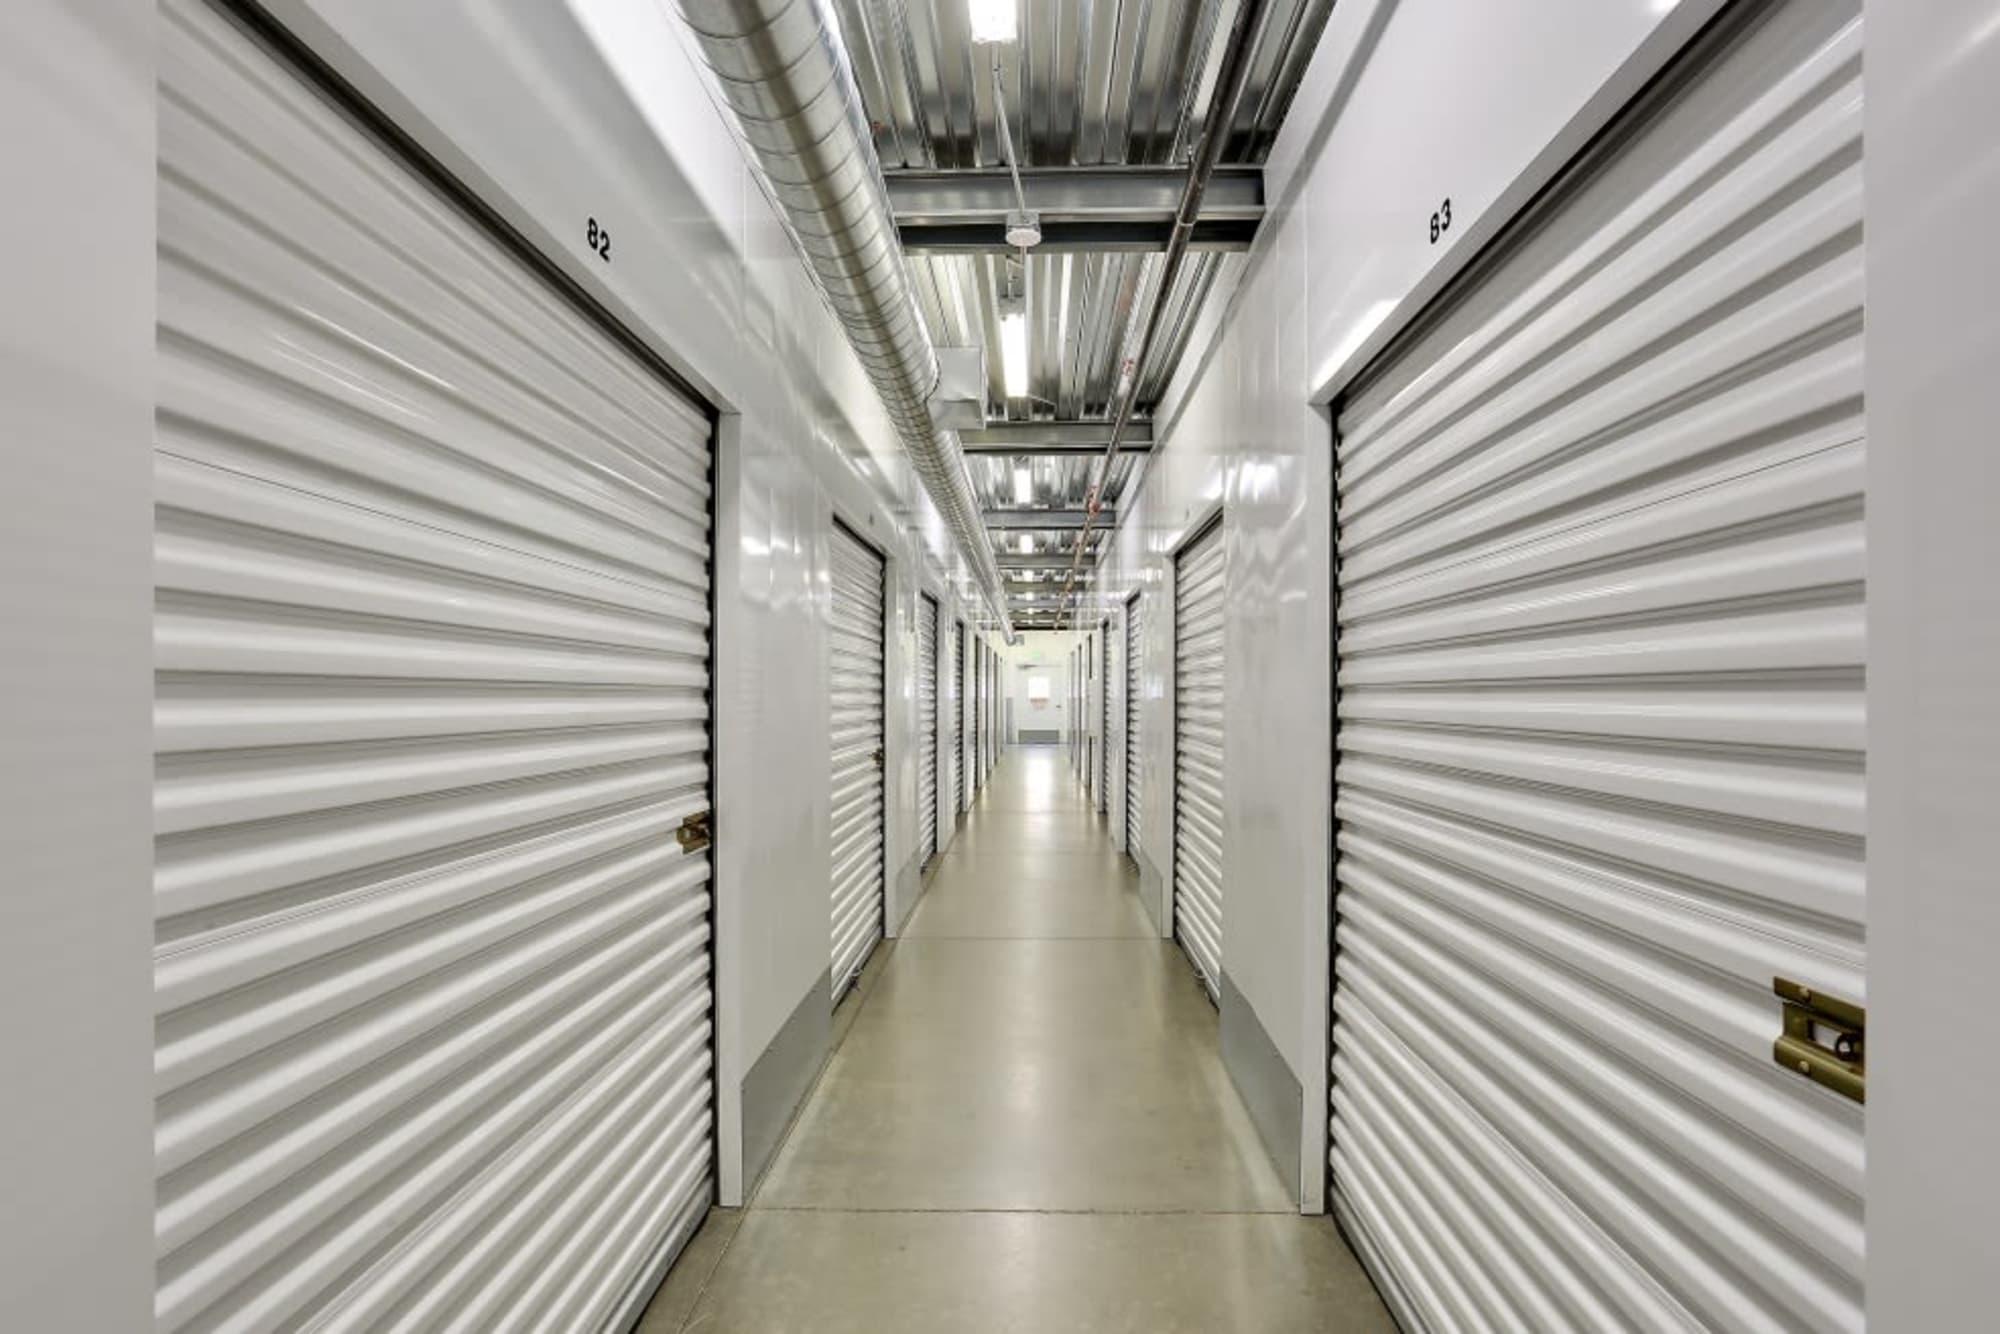 Interior self storage units atA-1 Self Storage in San Diego, CA